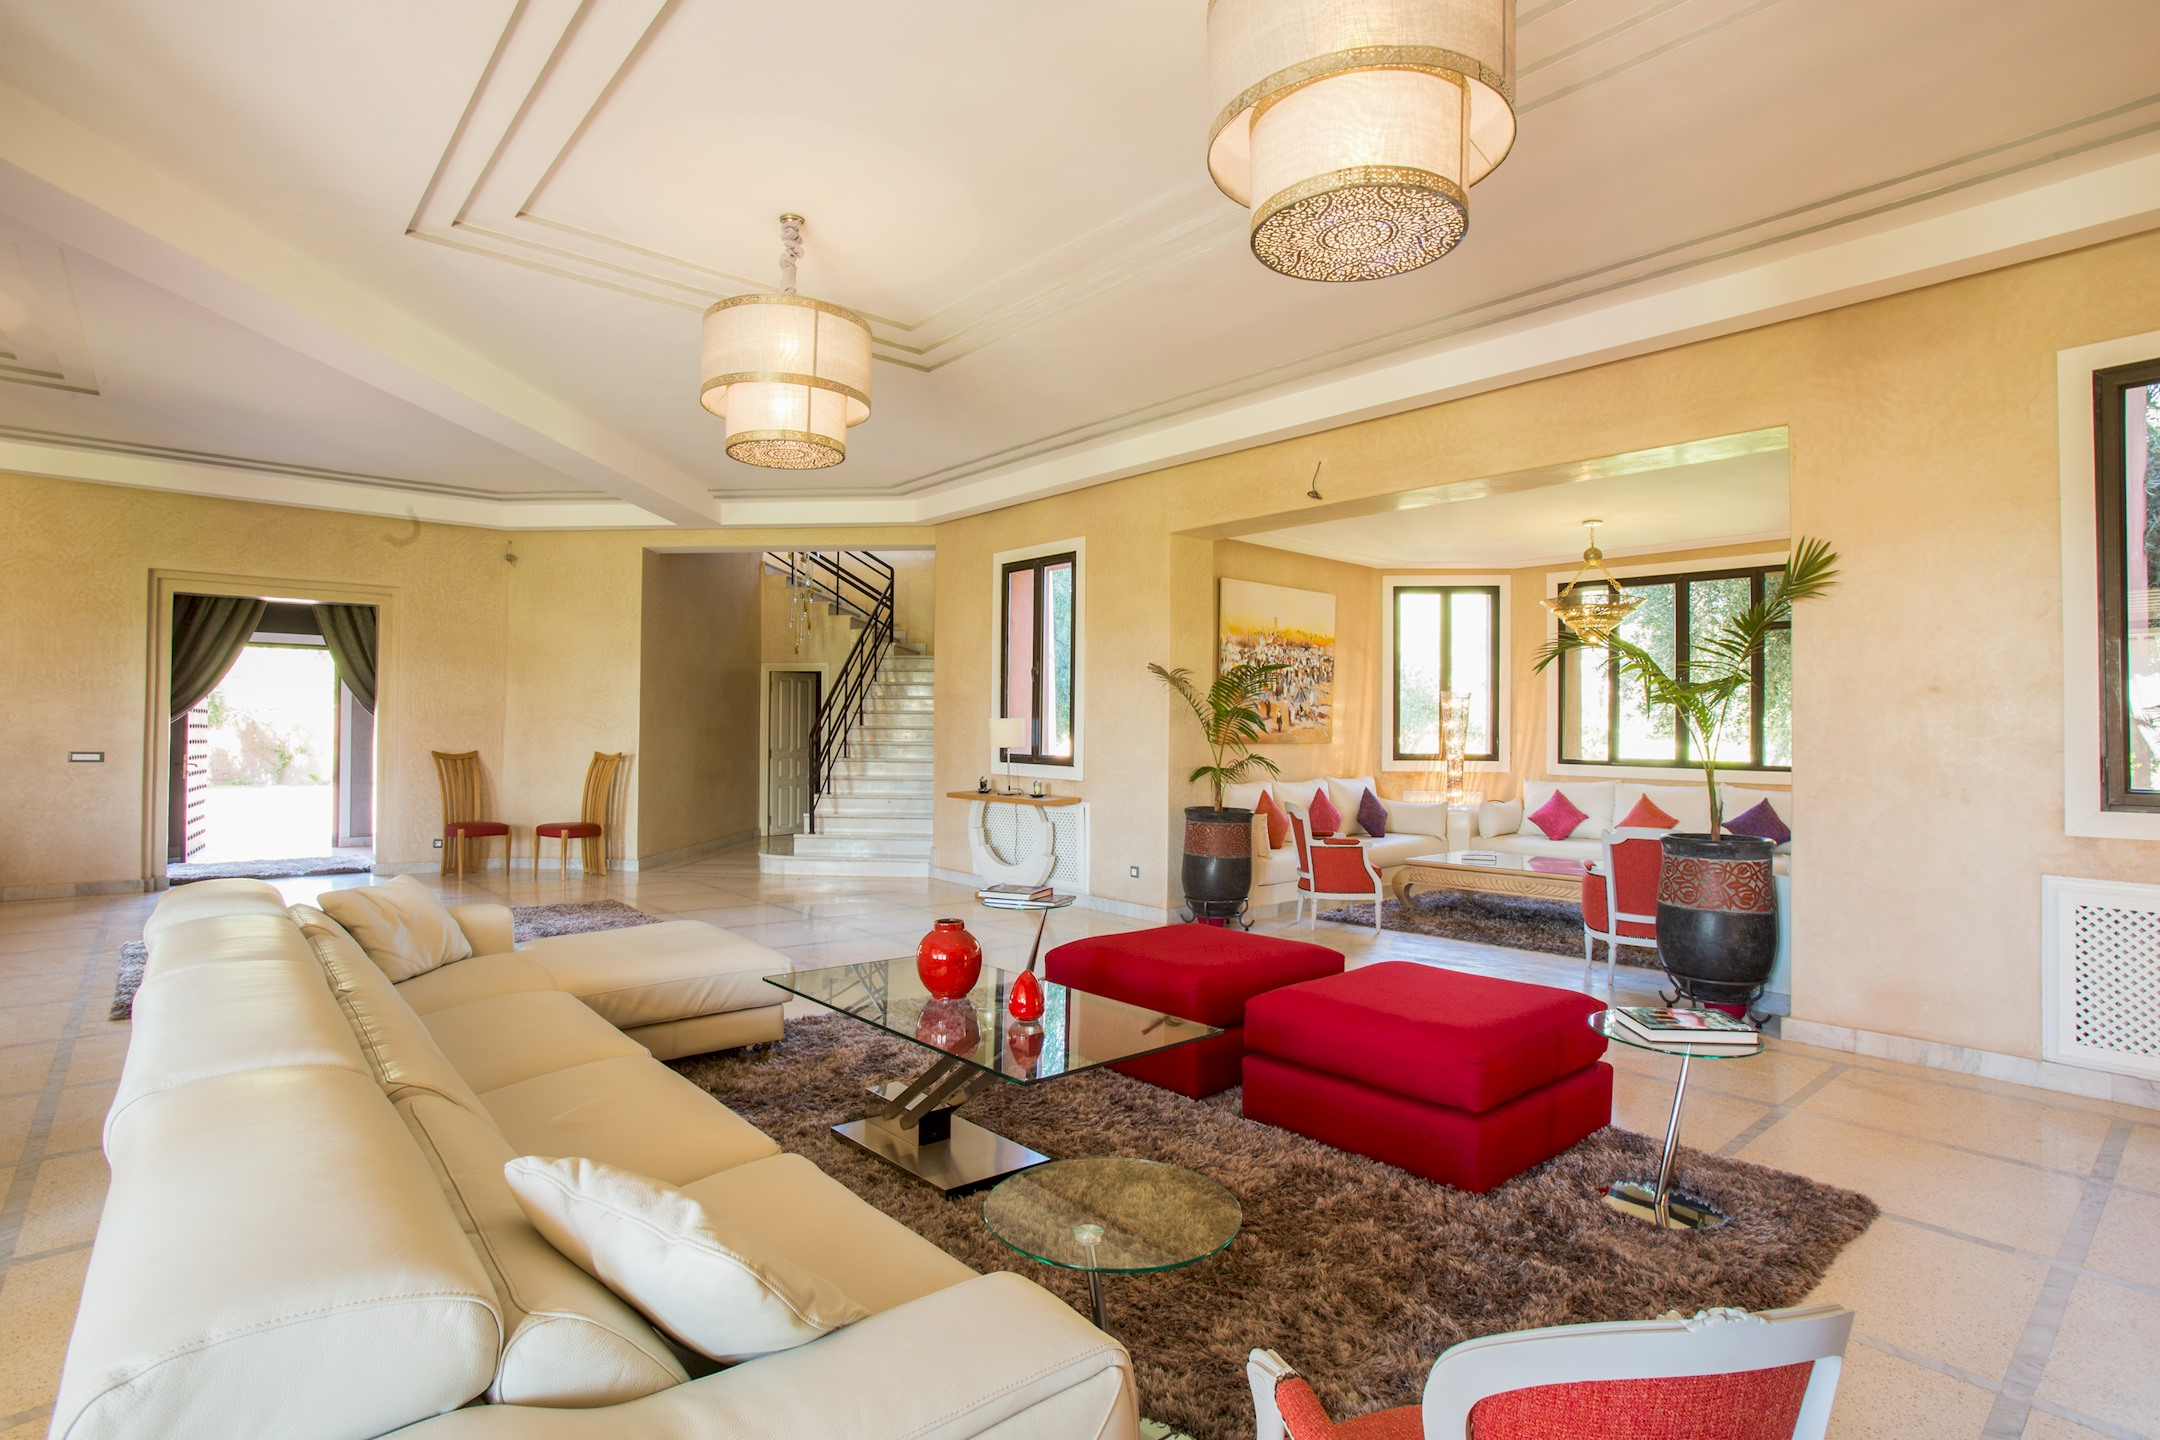 Apartment VILLA KOUTOUBIA - PISCINE CHAUFFEE  HAMMAM  JACUZZI  PETIT-DEJEUNER A MARRAKECH photo 20295909